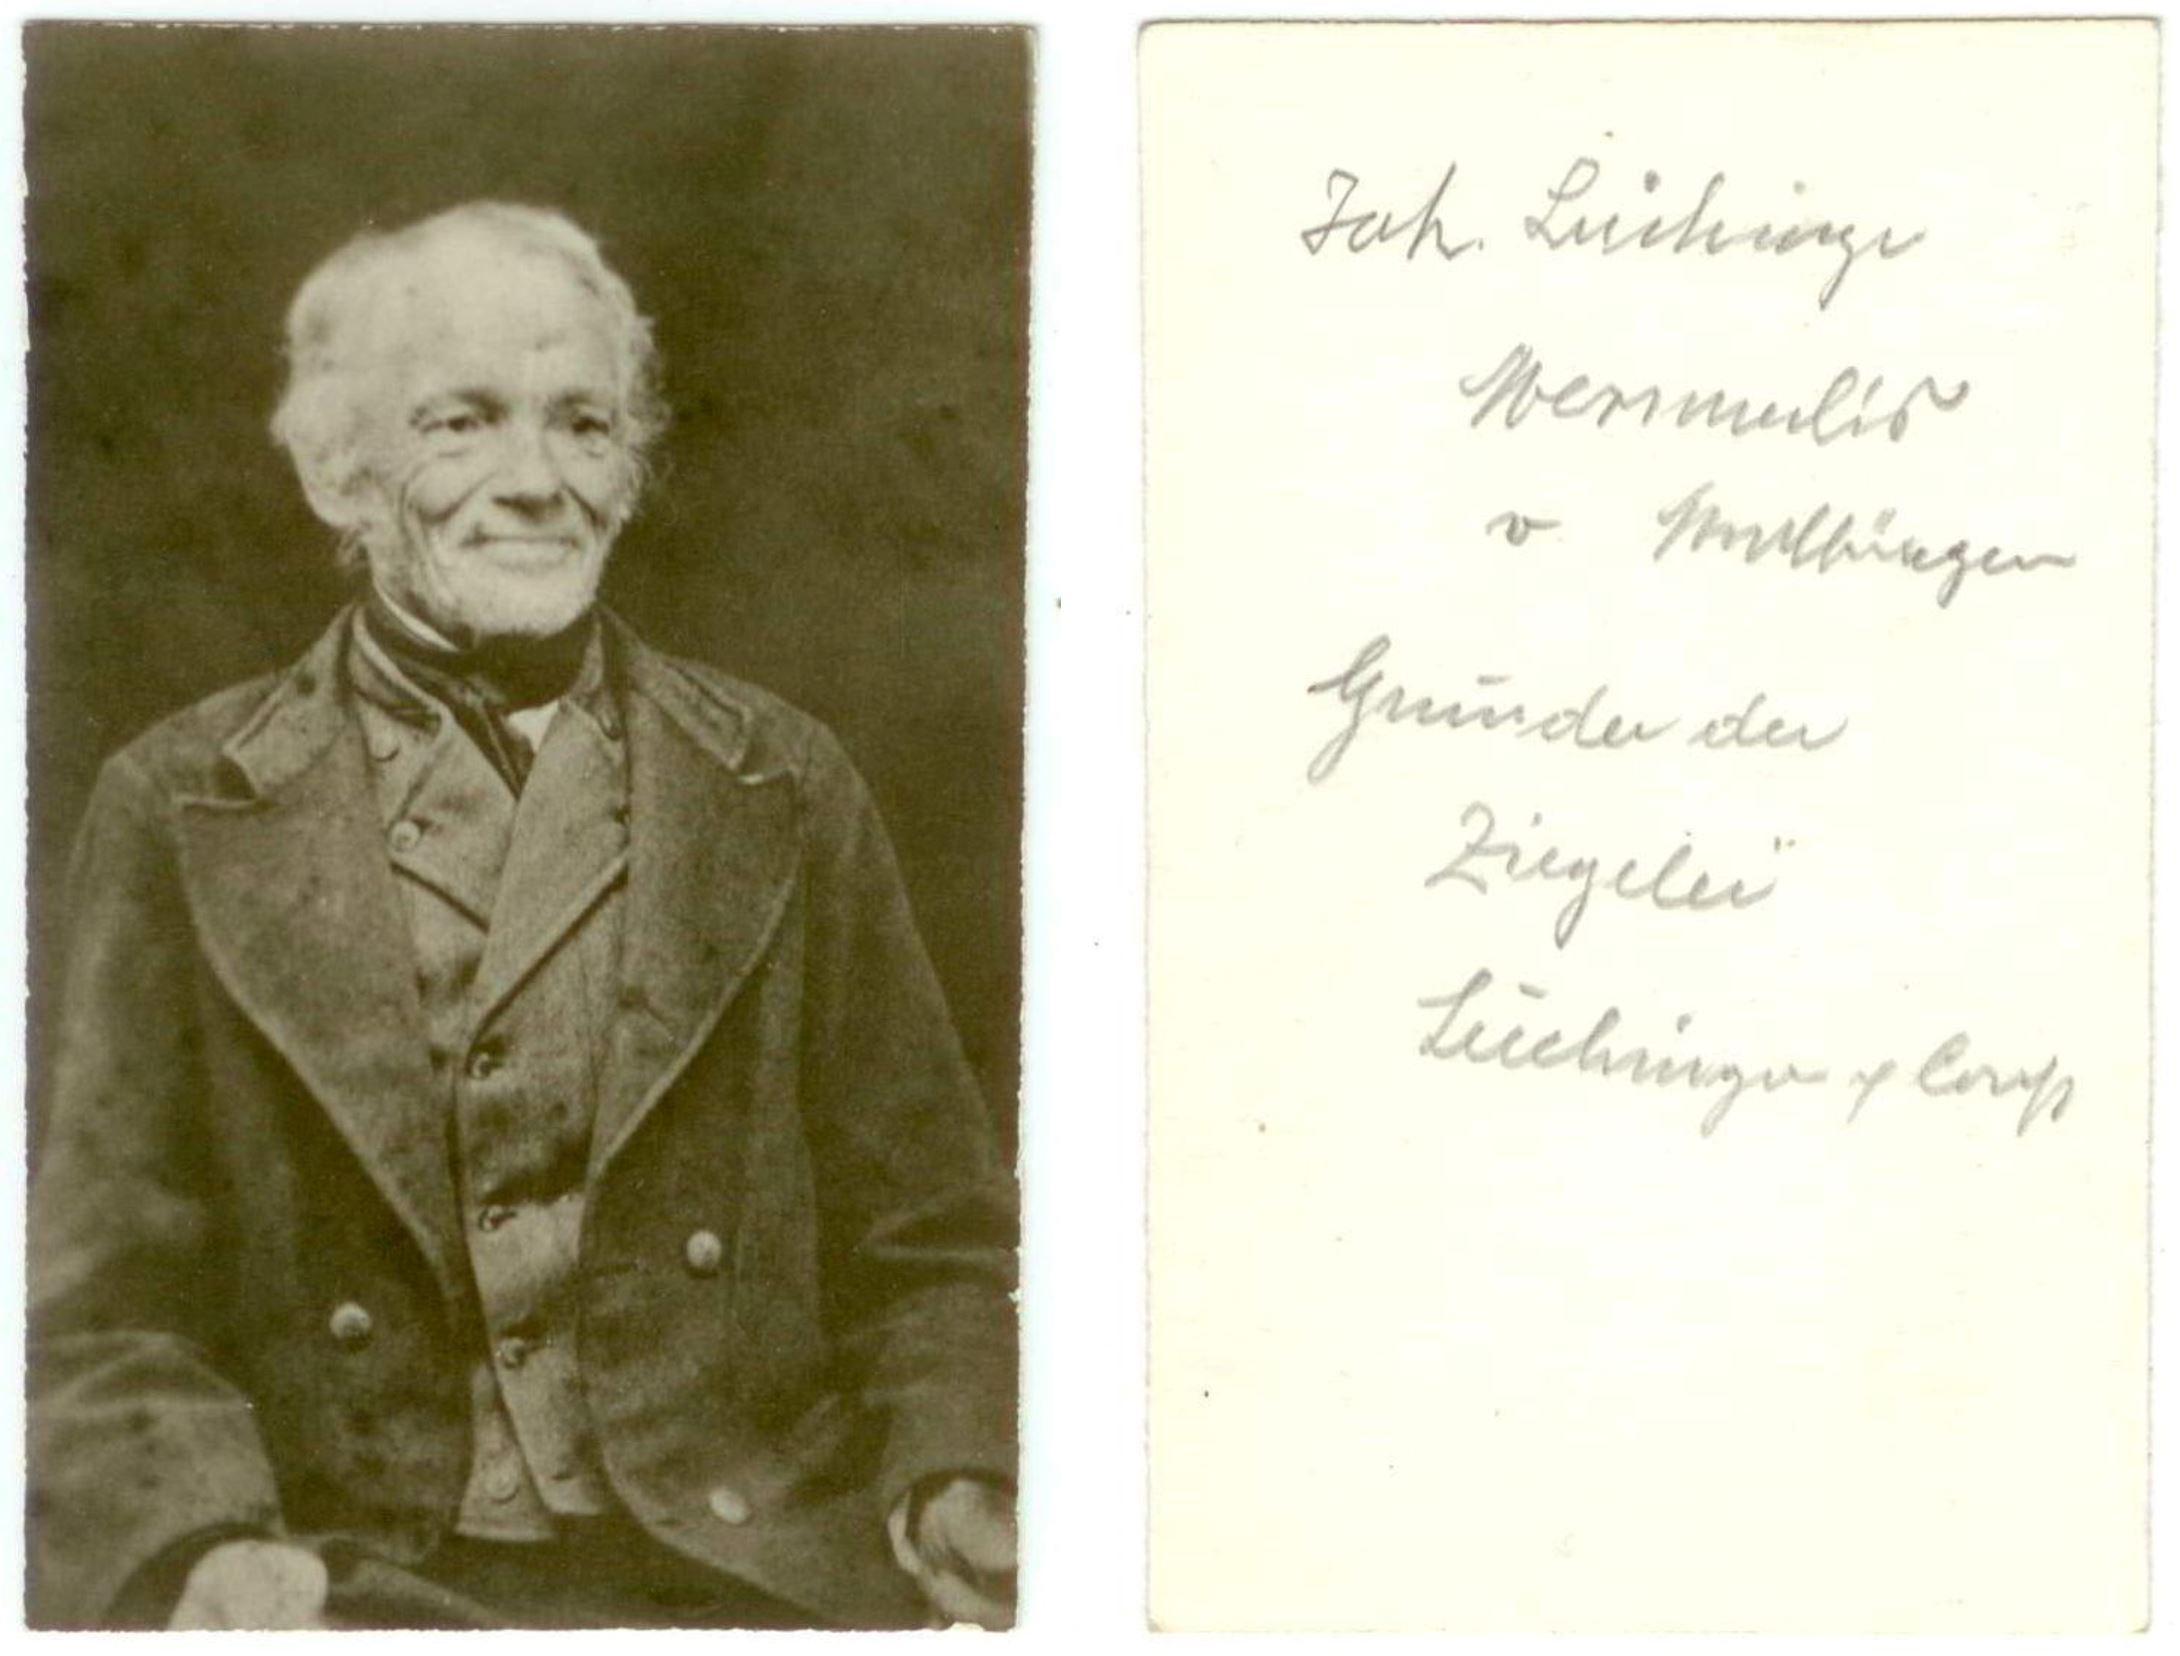 Jakob Lüchinger (1809-1886)